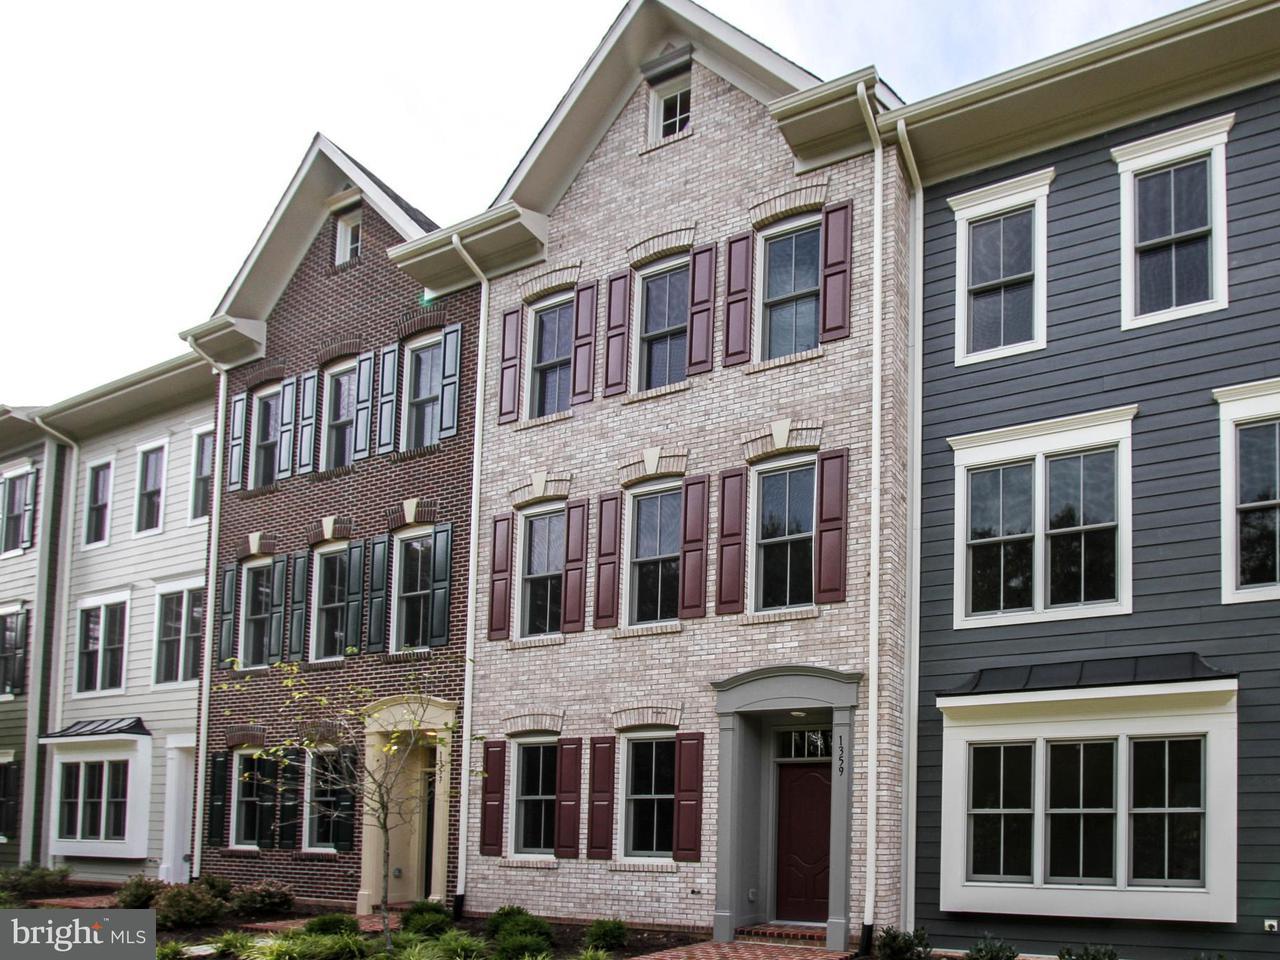 Single Family for Sale at 1359 Powhatan St #7 Alexandria, Virginia 22314 United States